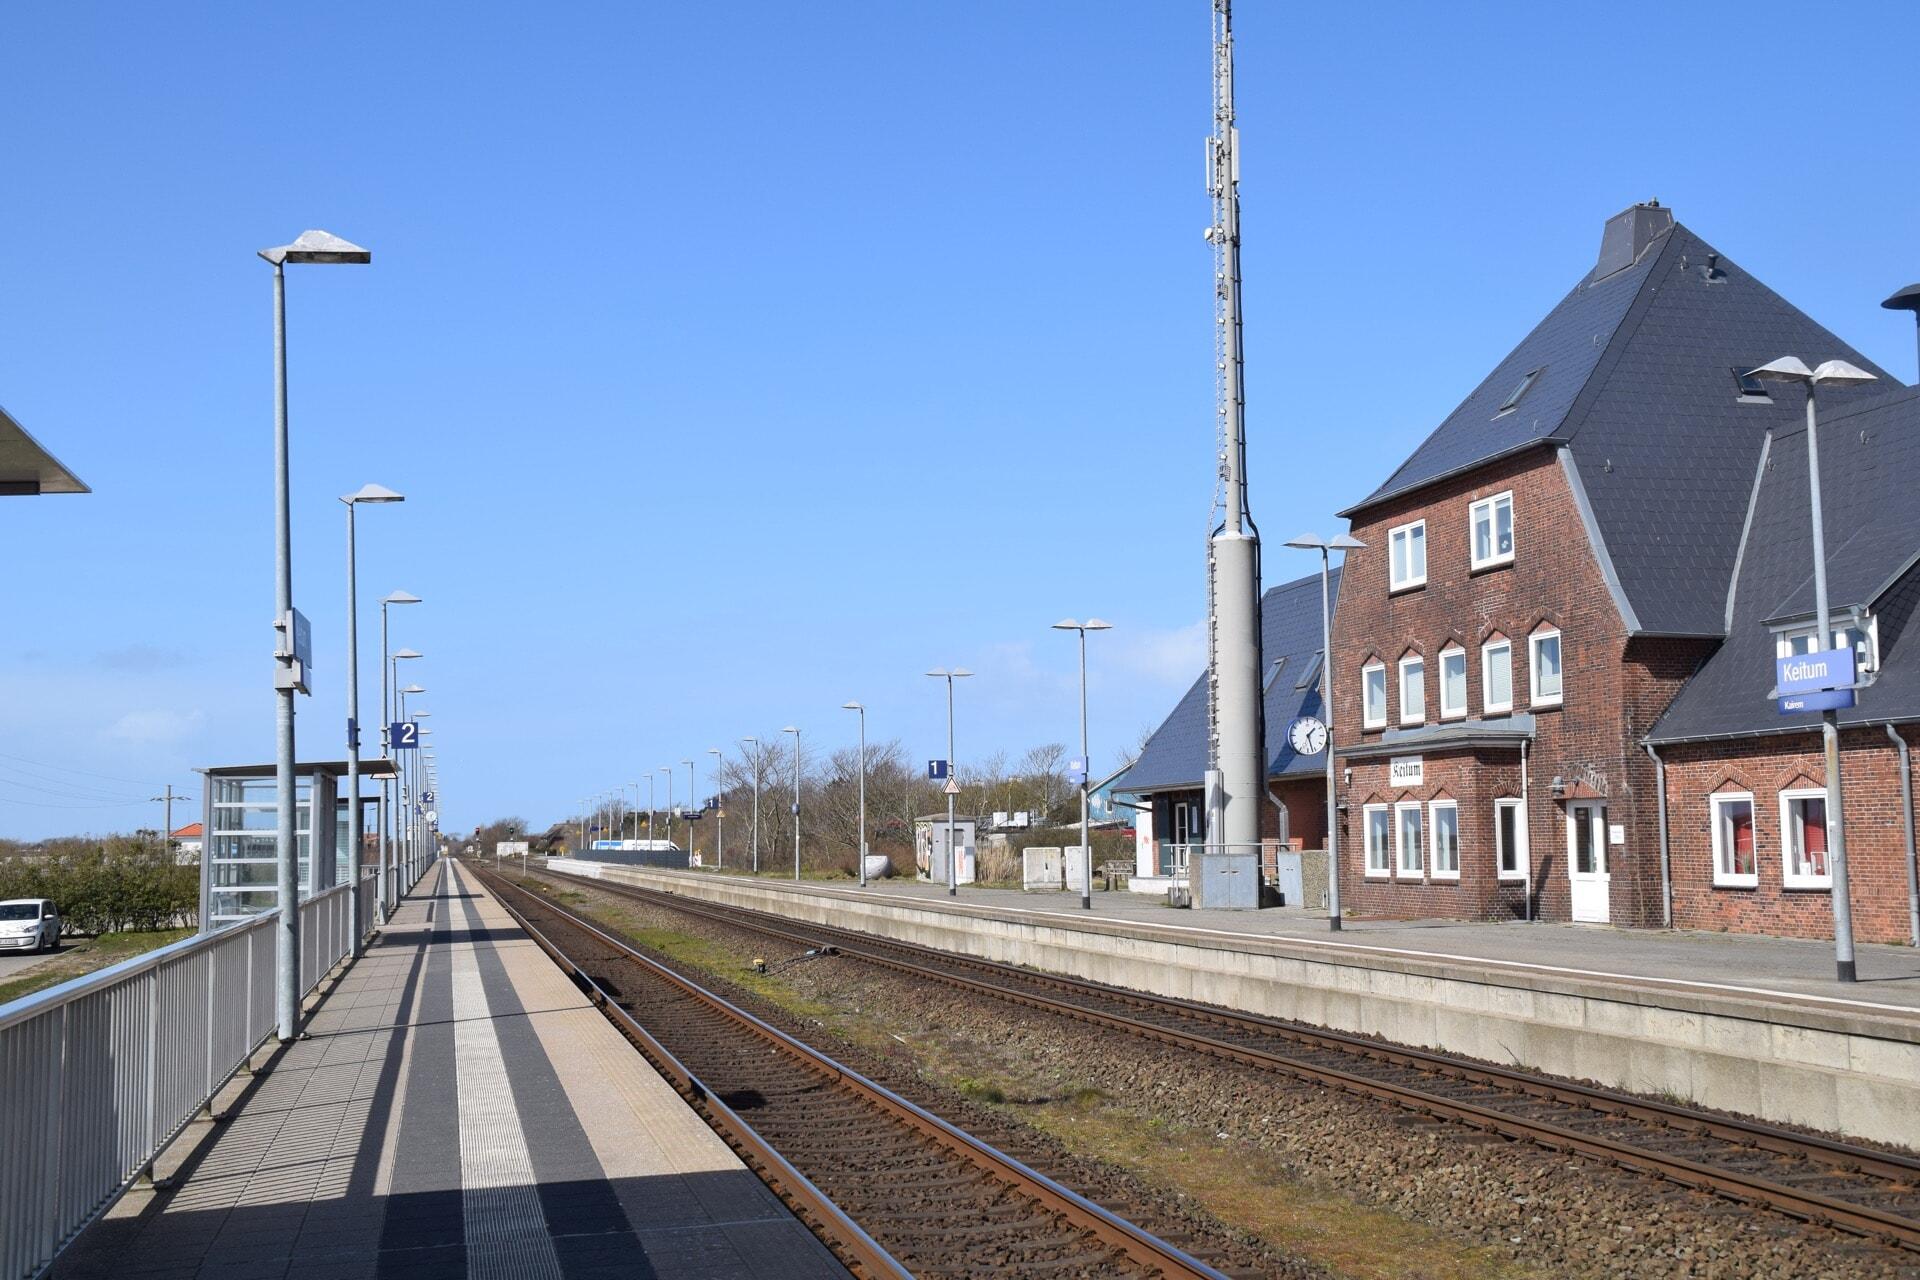 Keitumer Bahnhof